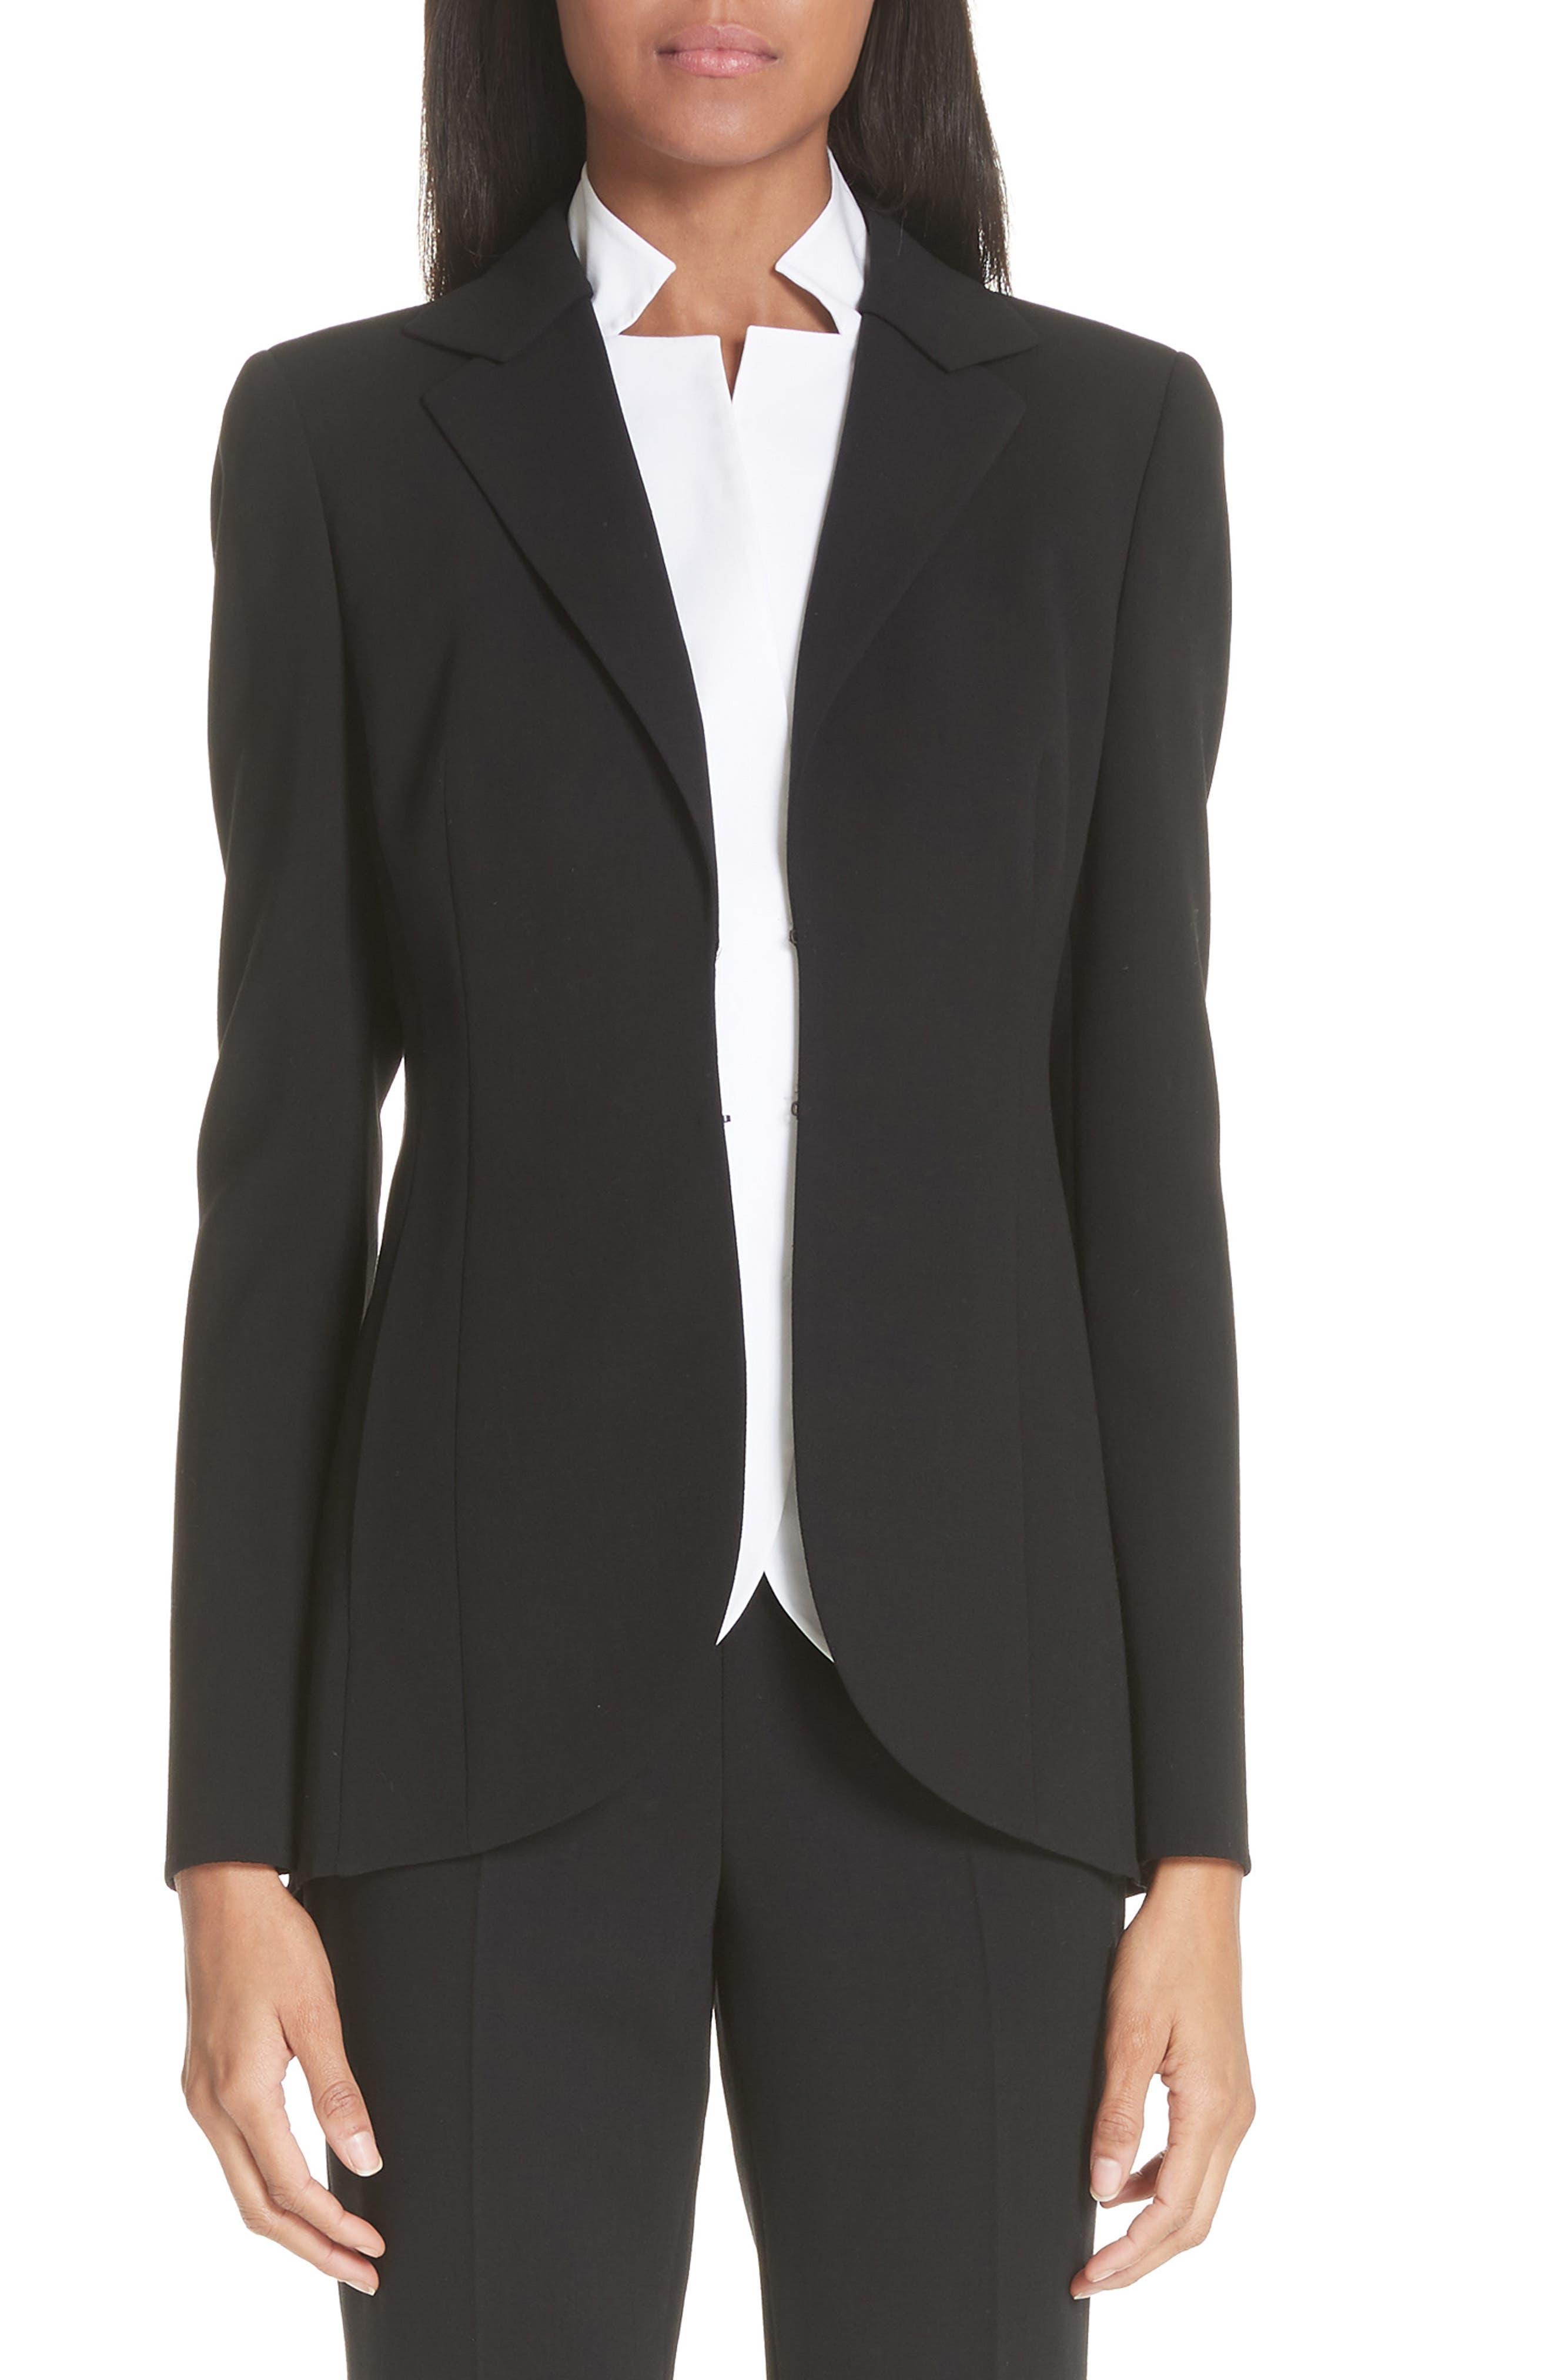 Alternate Image 1 Selected - Akris 'Pentagon' Double Face Wool Jacket